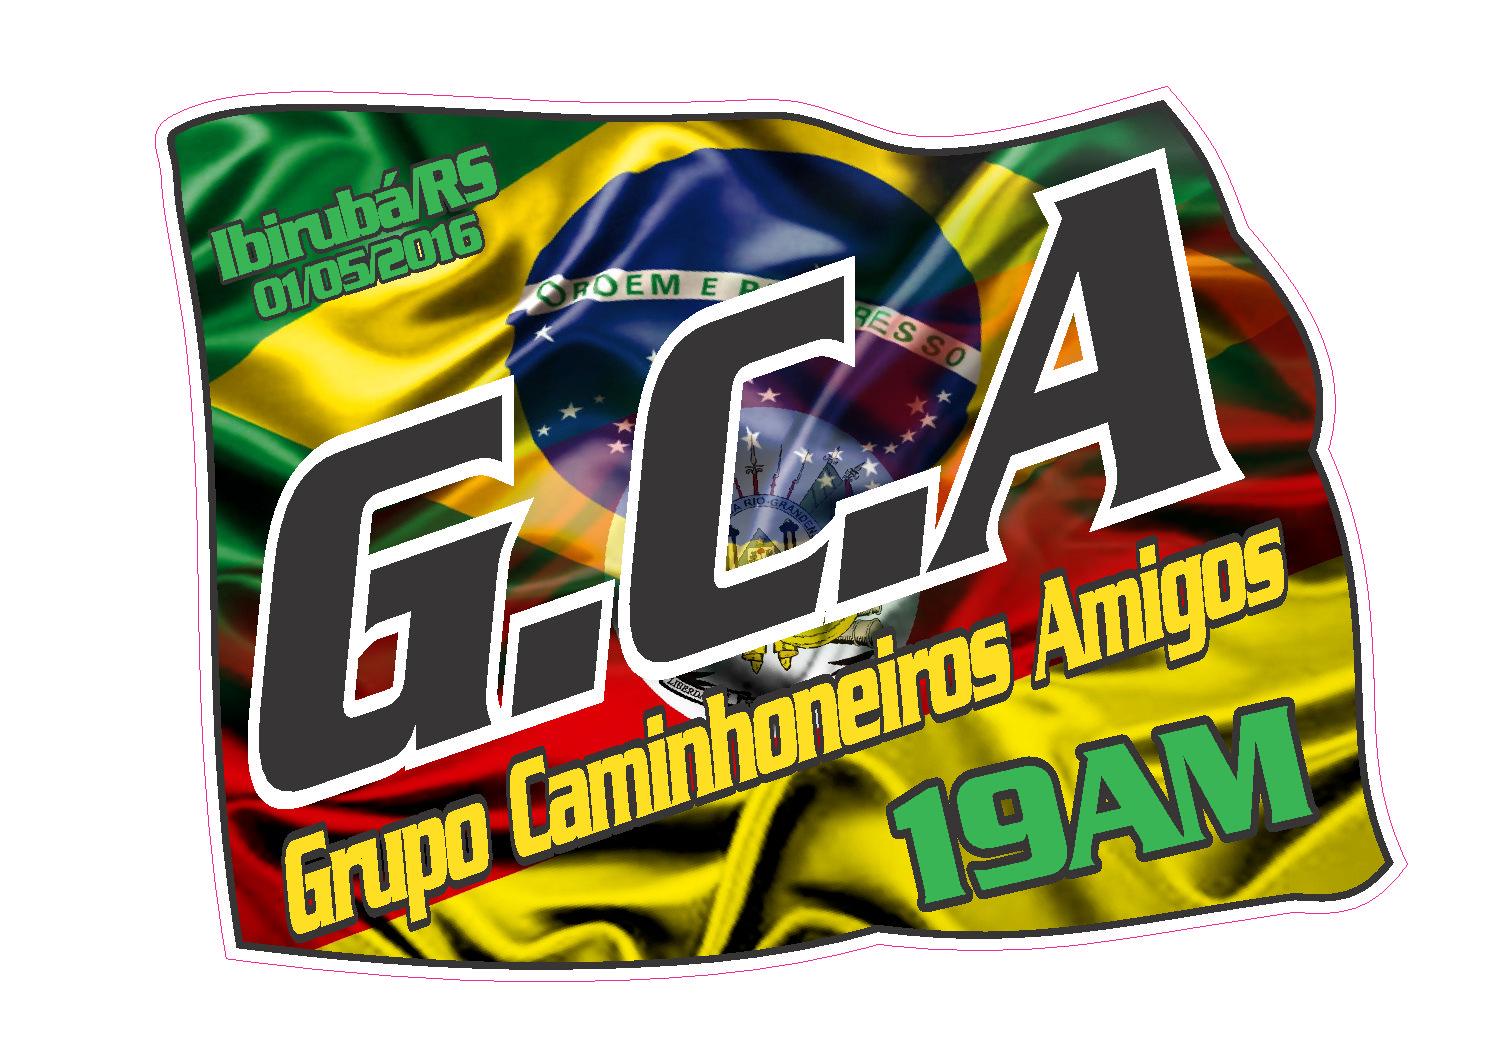 CAMISETAS PARA G.C.A GRUPO DE CAMINHONEIROS AMIGOS DE IBIRUBÁ/RS.